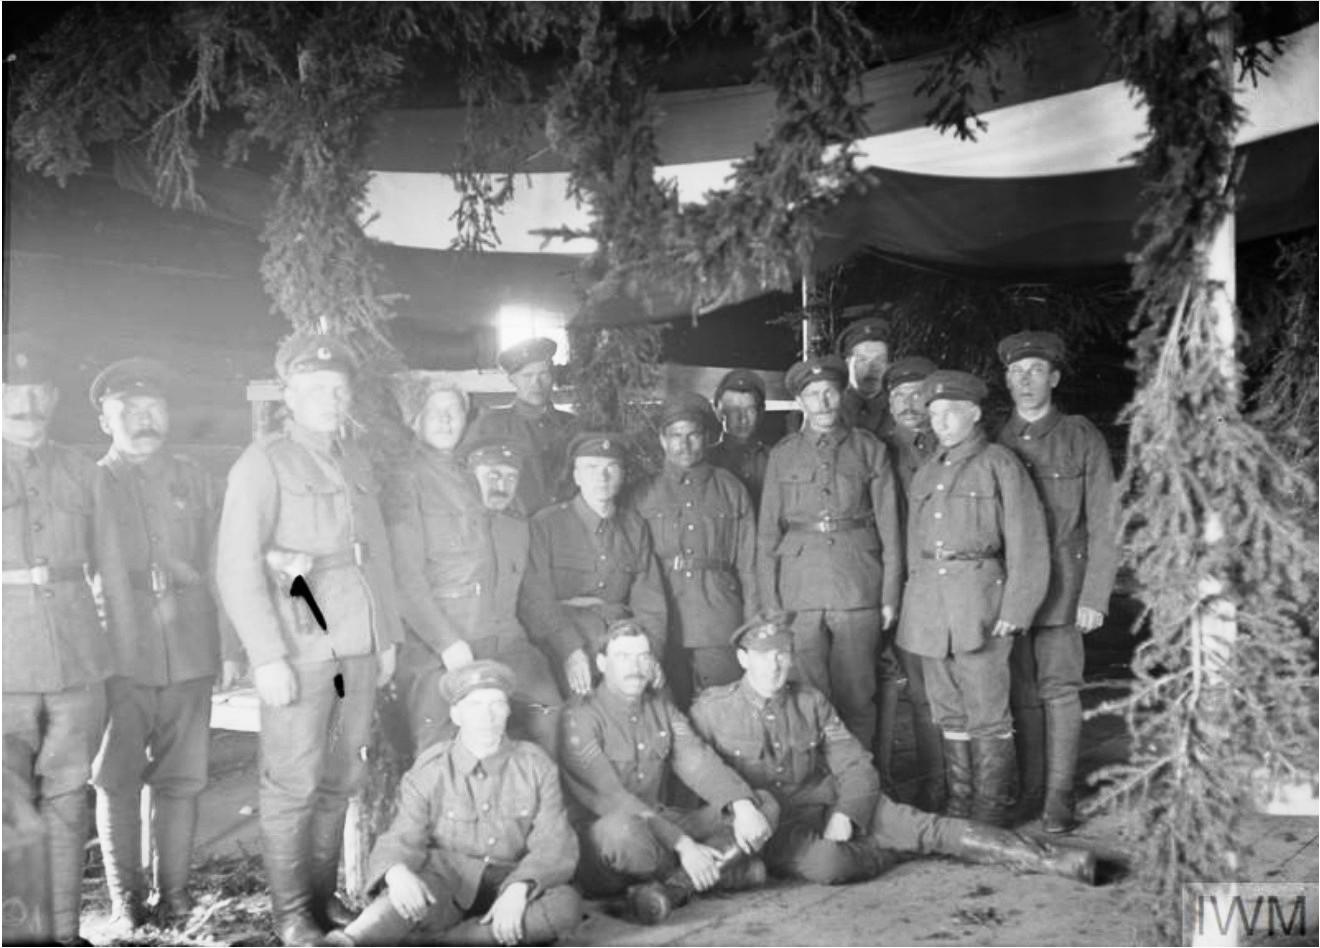 1919. Интерьер армейской казармы, украшенной на Пасху, Мурманск